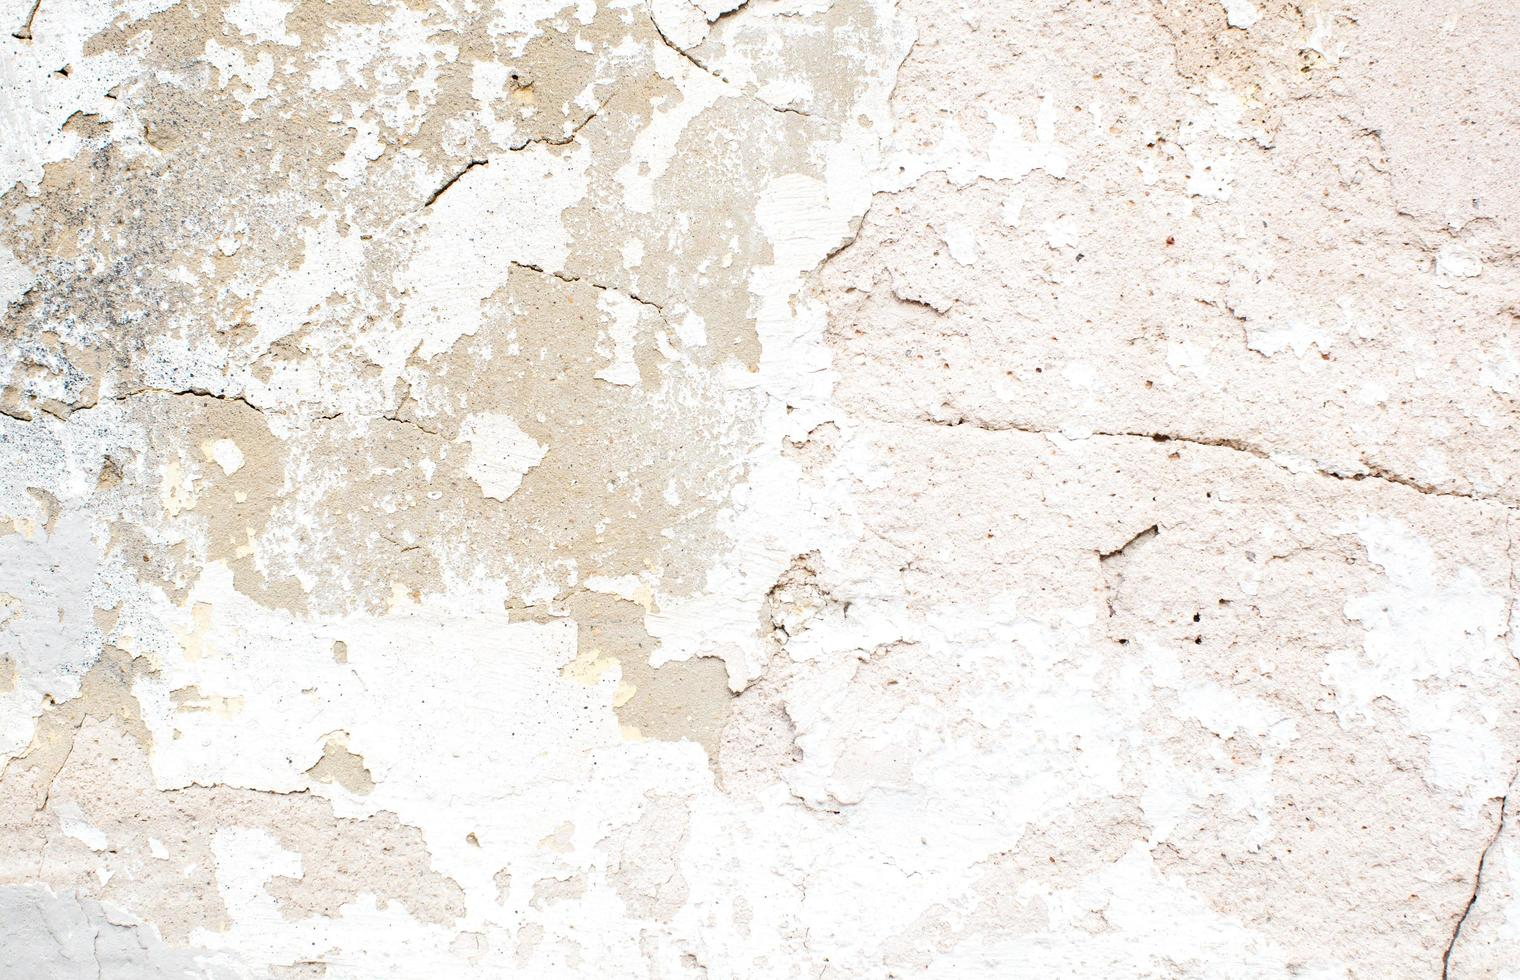 beige afgestoken verf muur textuur foto